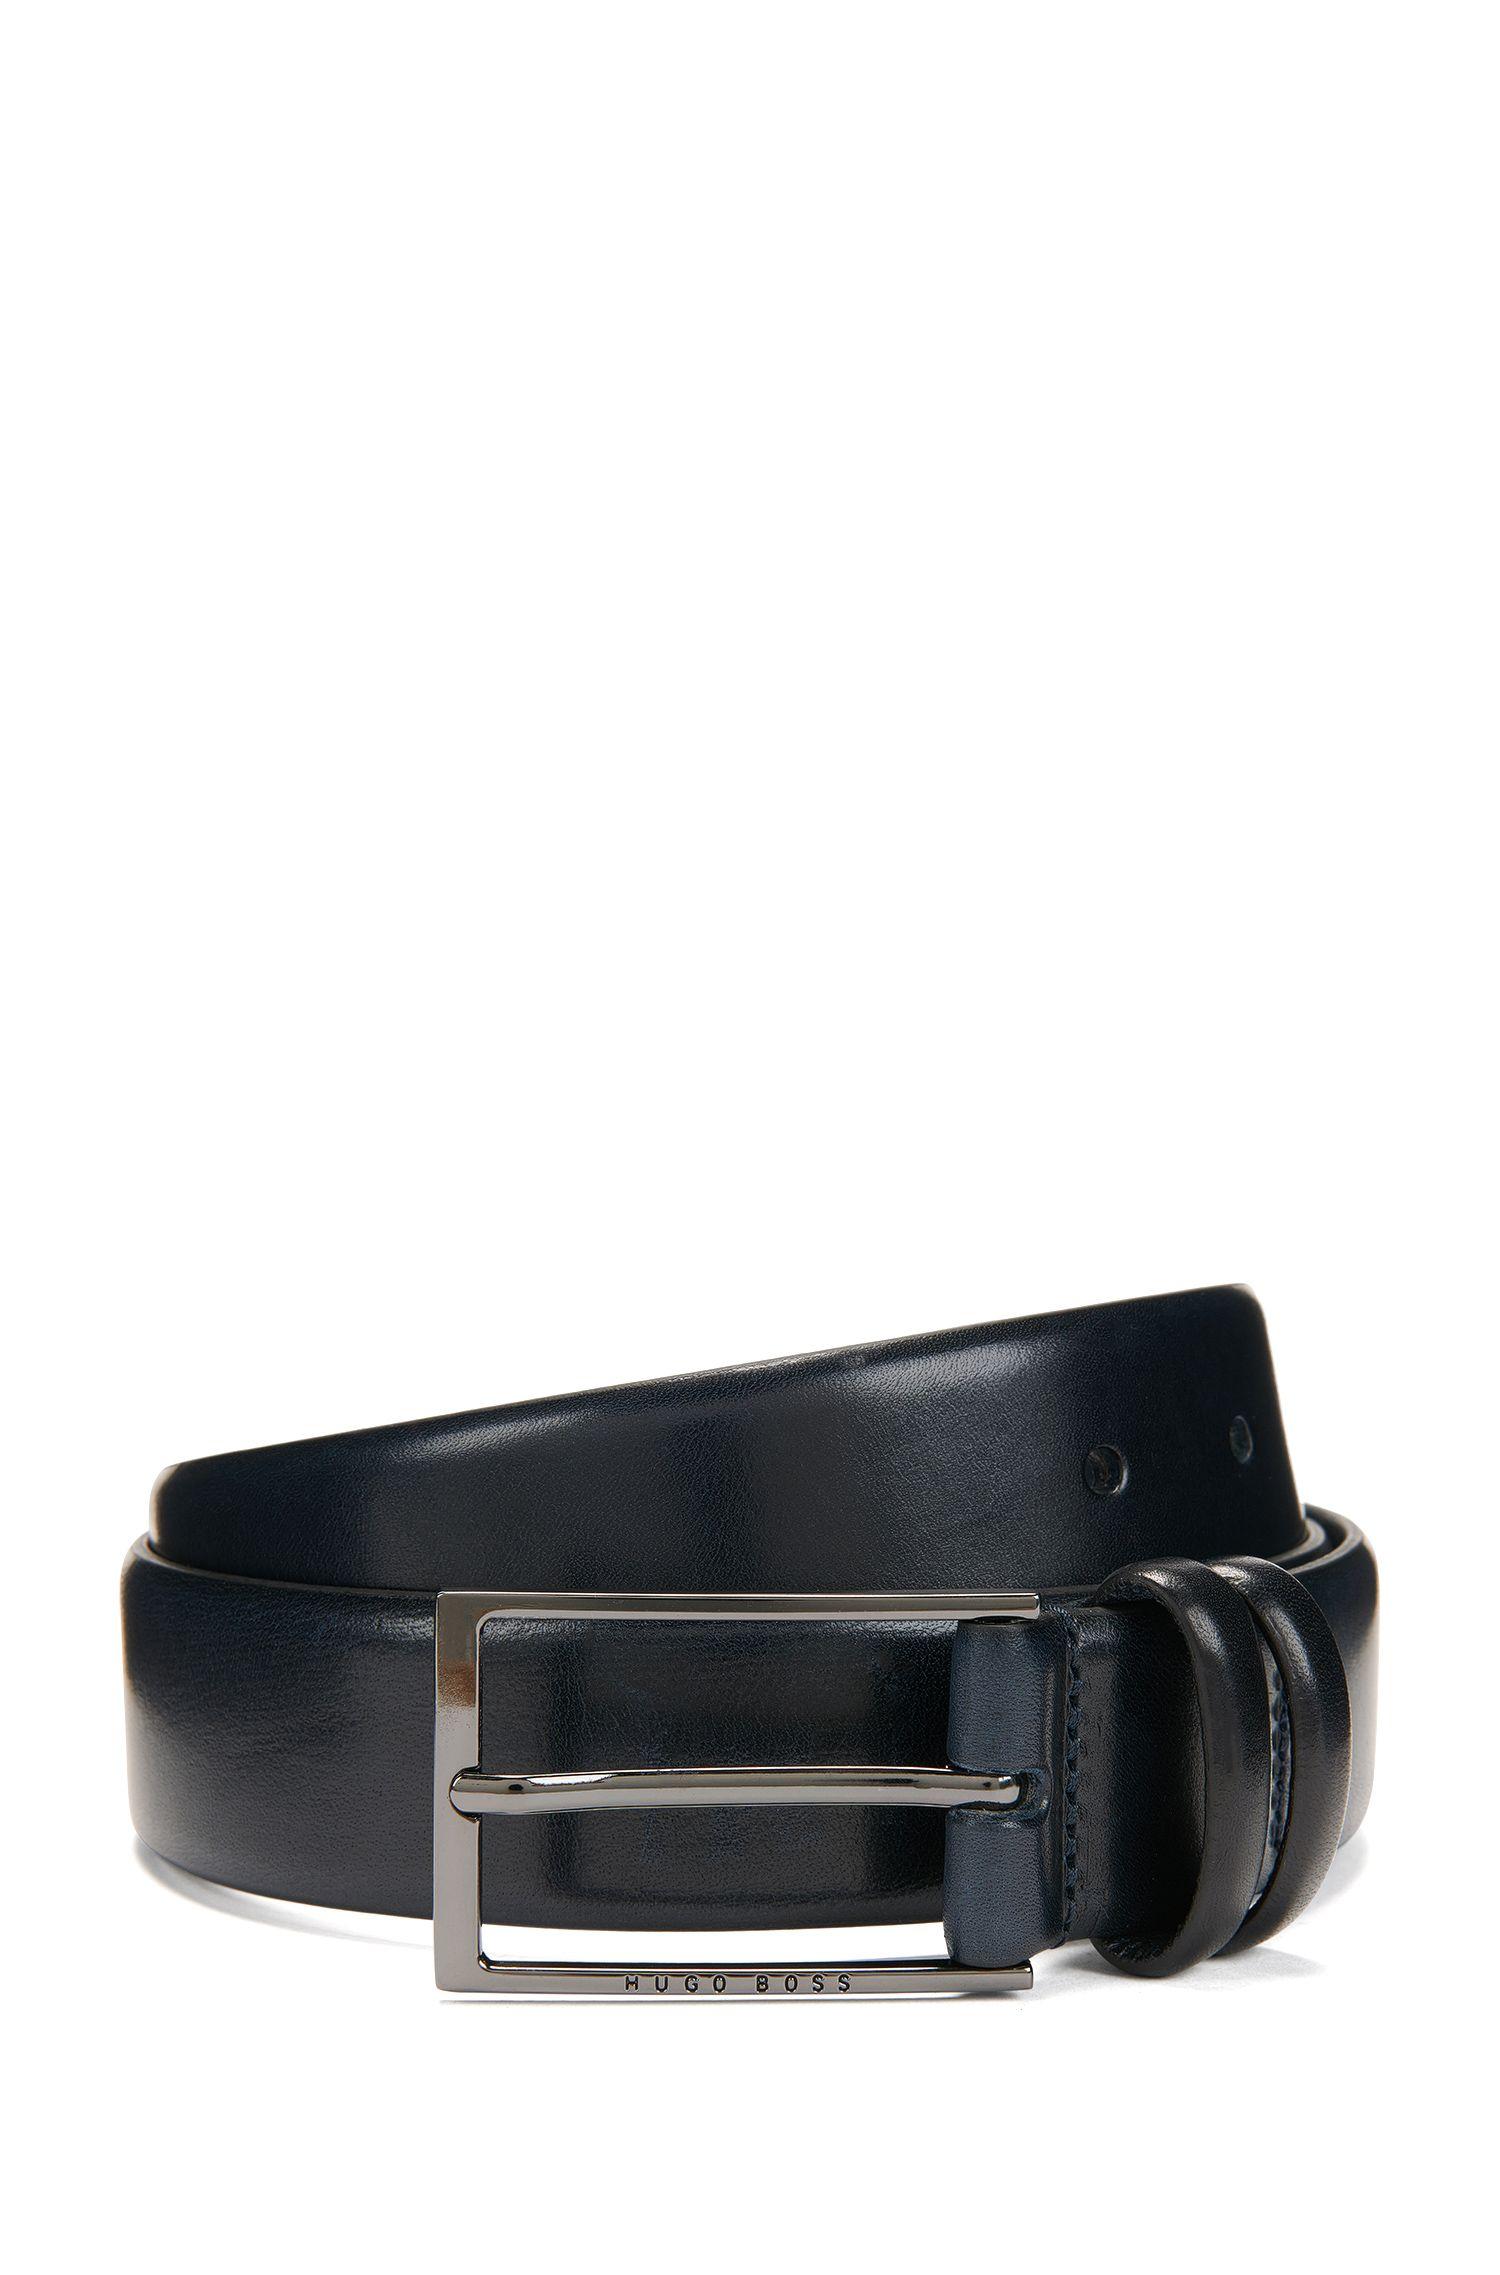 Shiny Leather Belt | Carmello